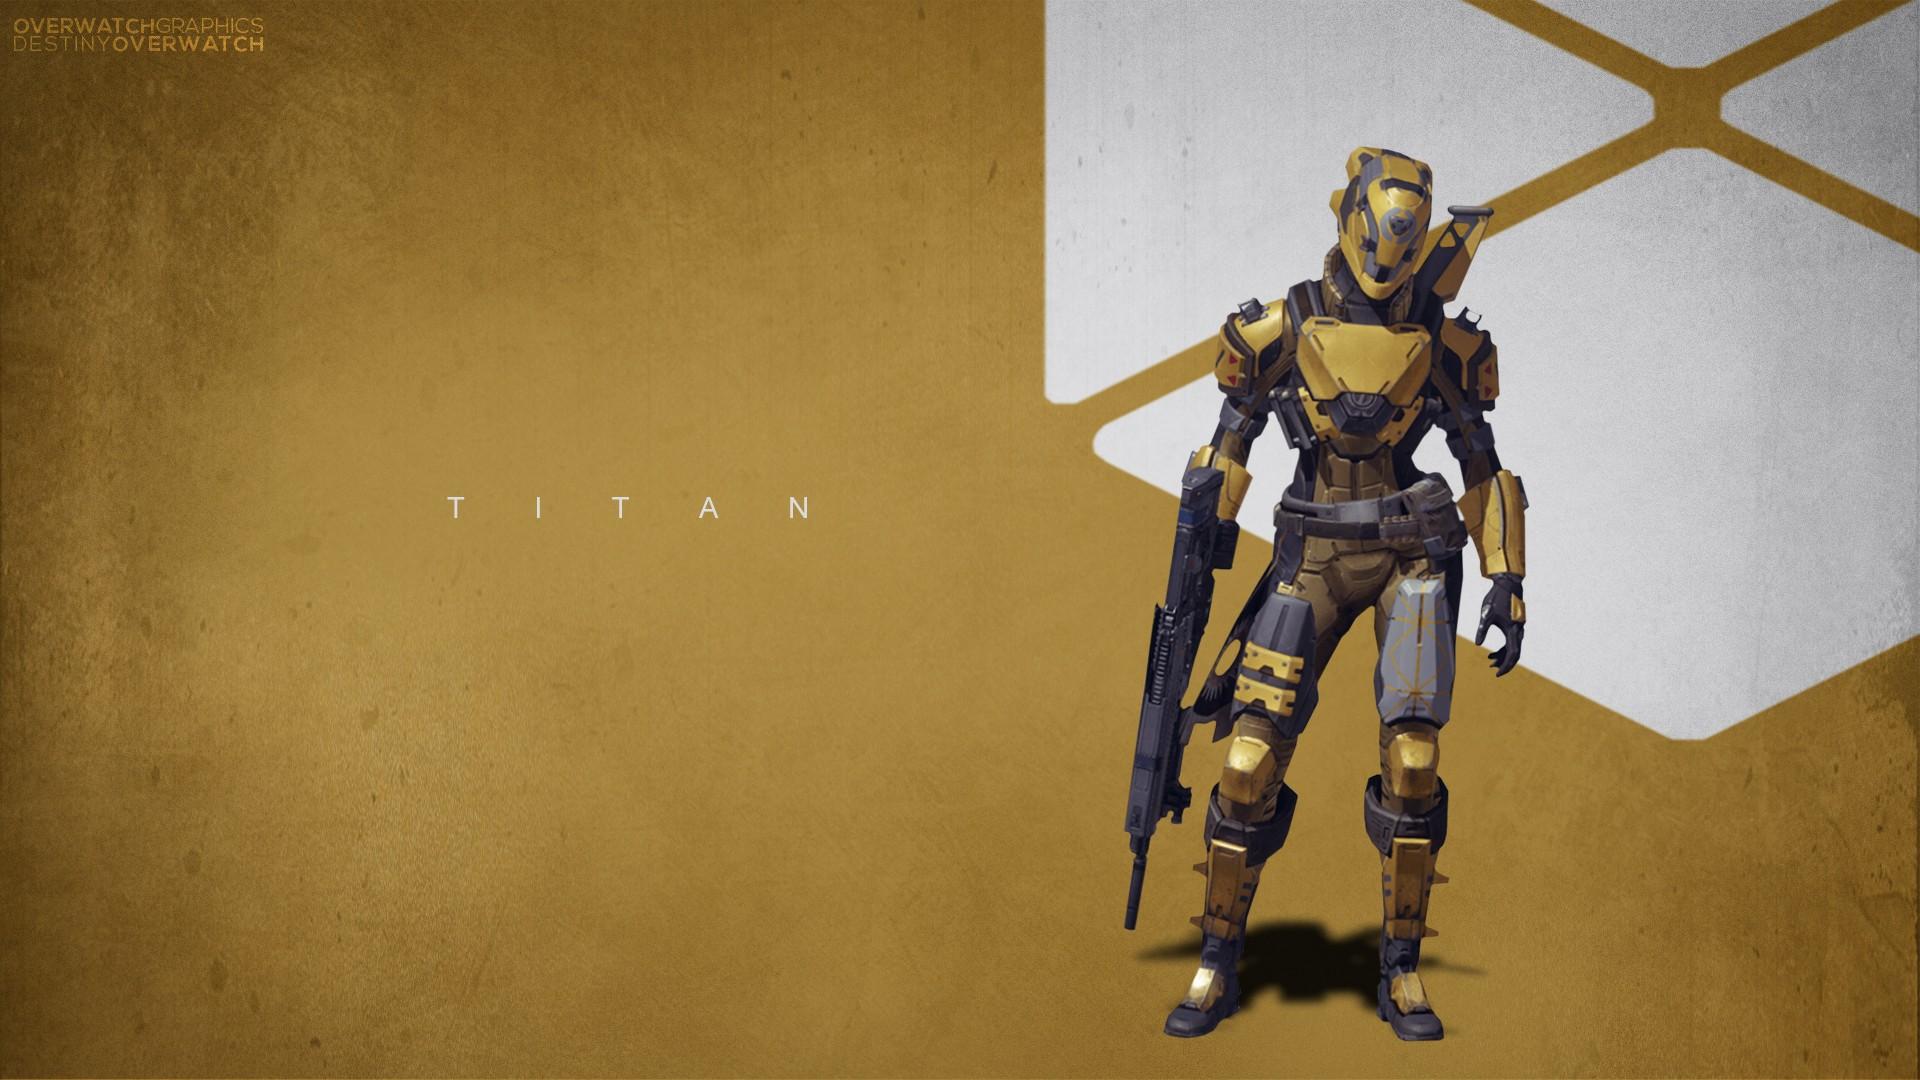 Destiny Titan wallpaper ·① Download free amazing High ...